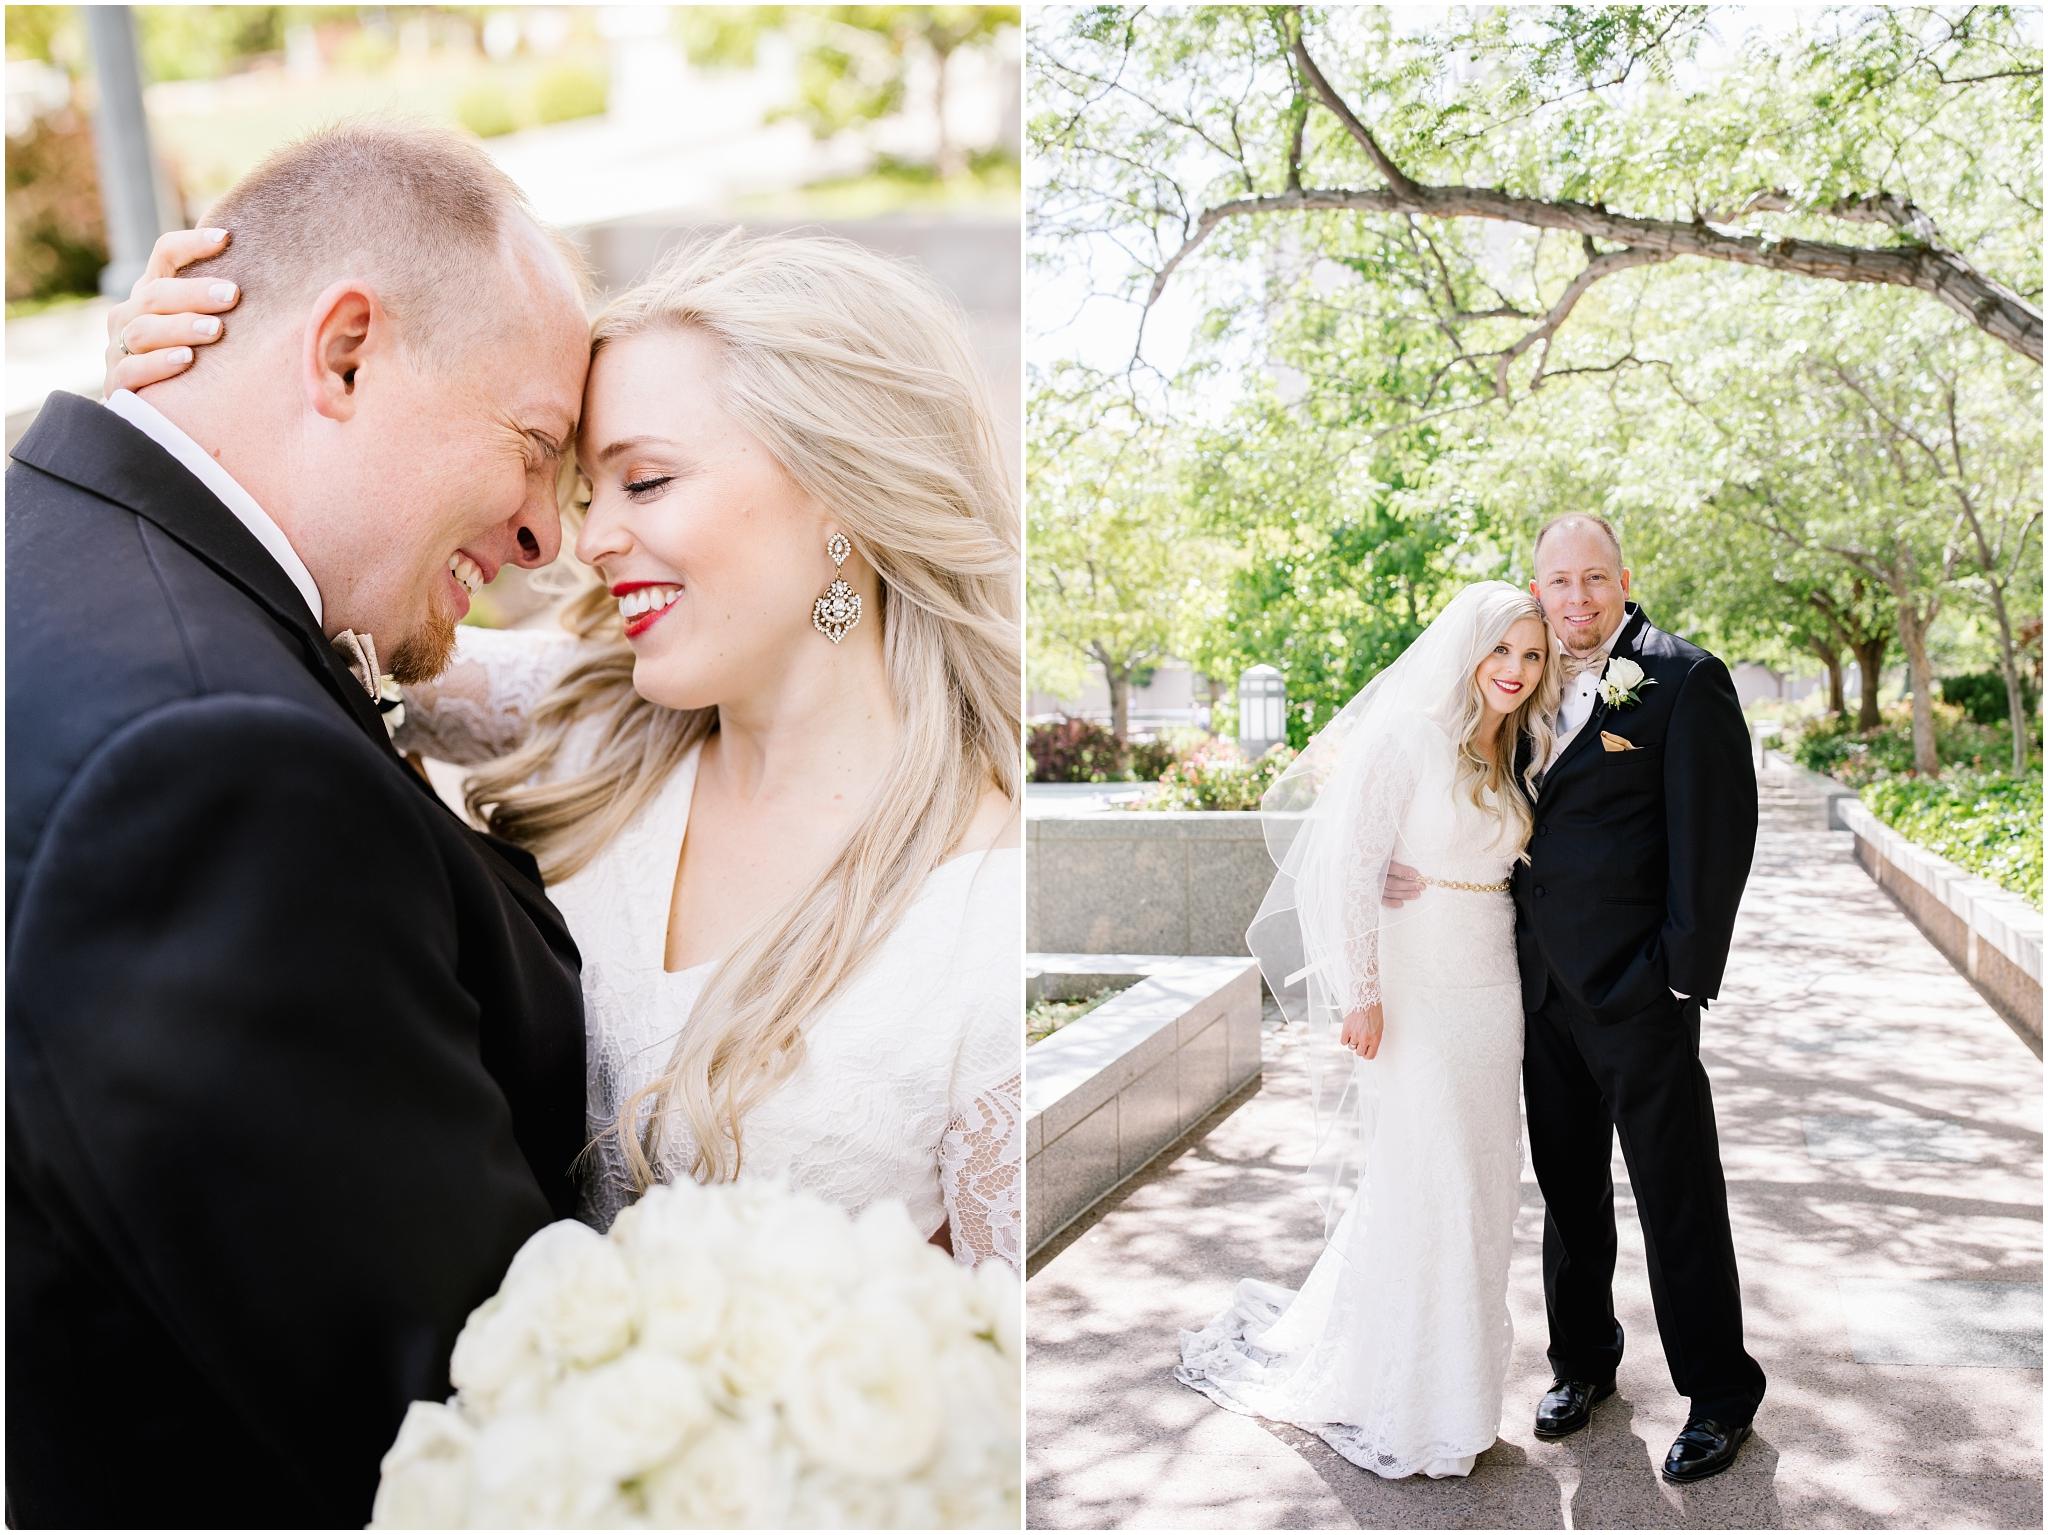 CherylandTyler-253_Lizzie-B-Imagery-Utah-Wedding-Photographer-Salt-Lake-City-Temple-Wells-Fargo-Building-Reception.jpg